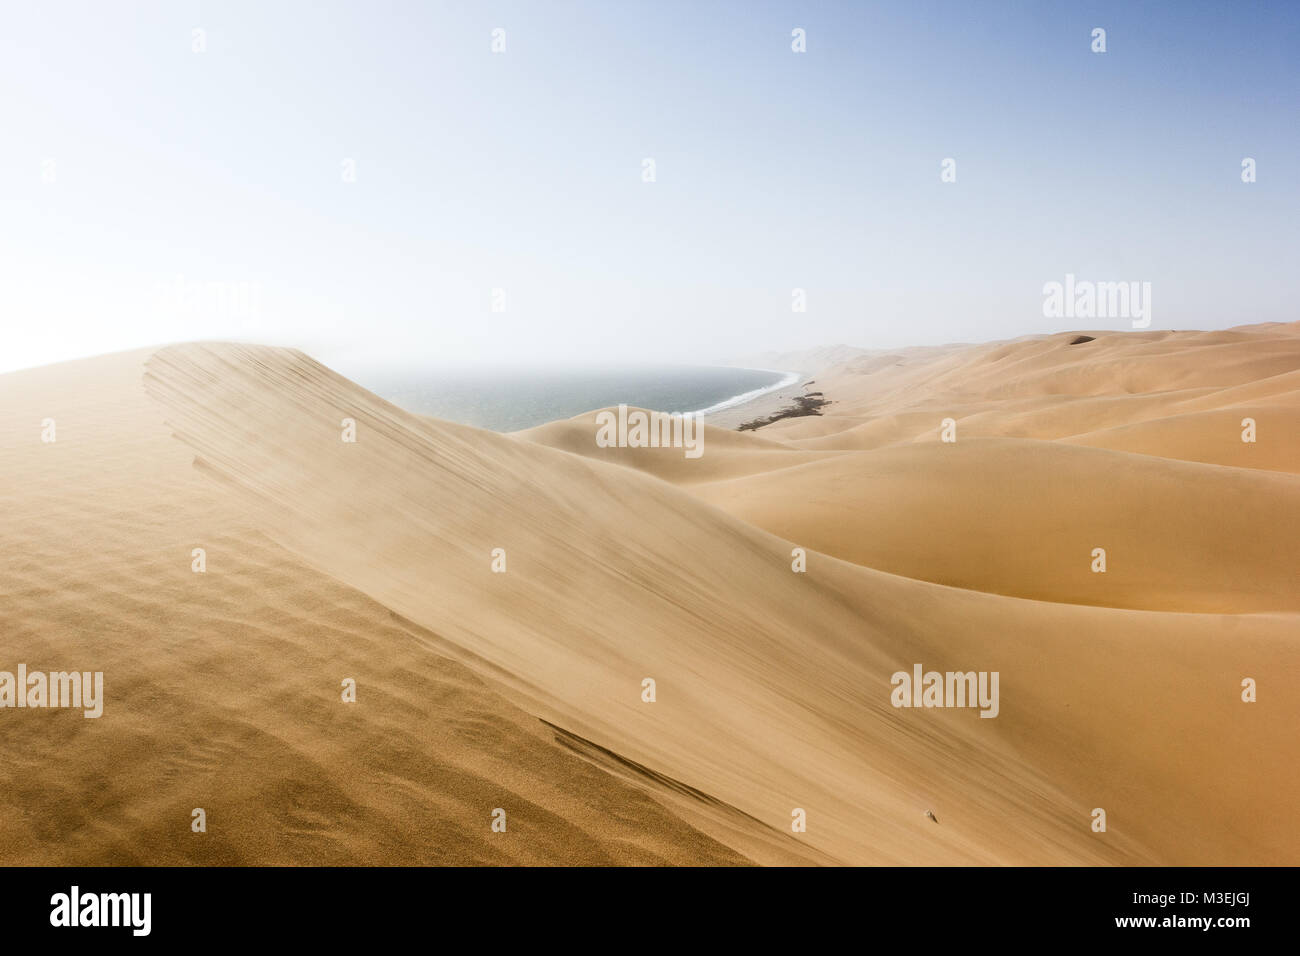 Sandwich Harbour, wo die Wüste den Ozean trifft, Namibia, Afrika Stockfoto